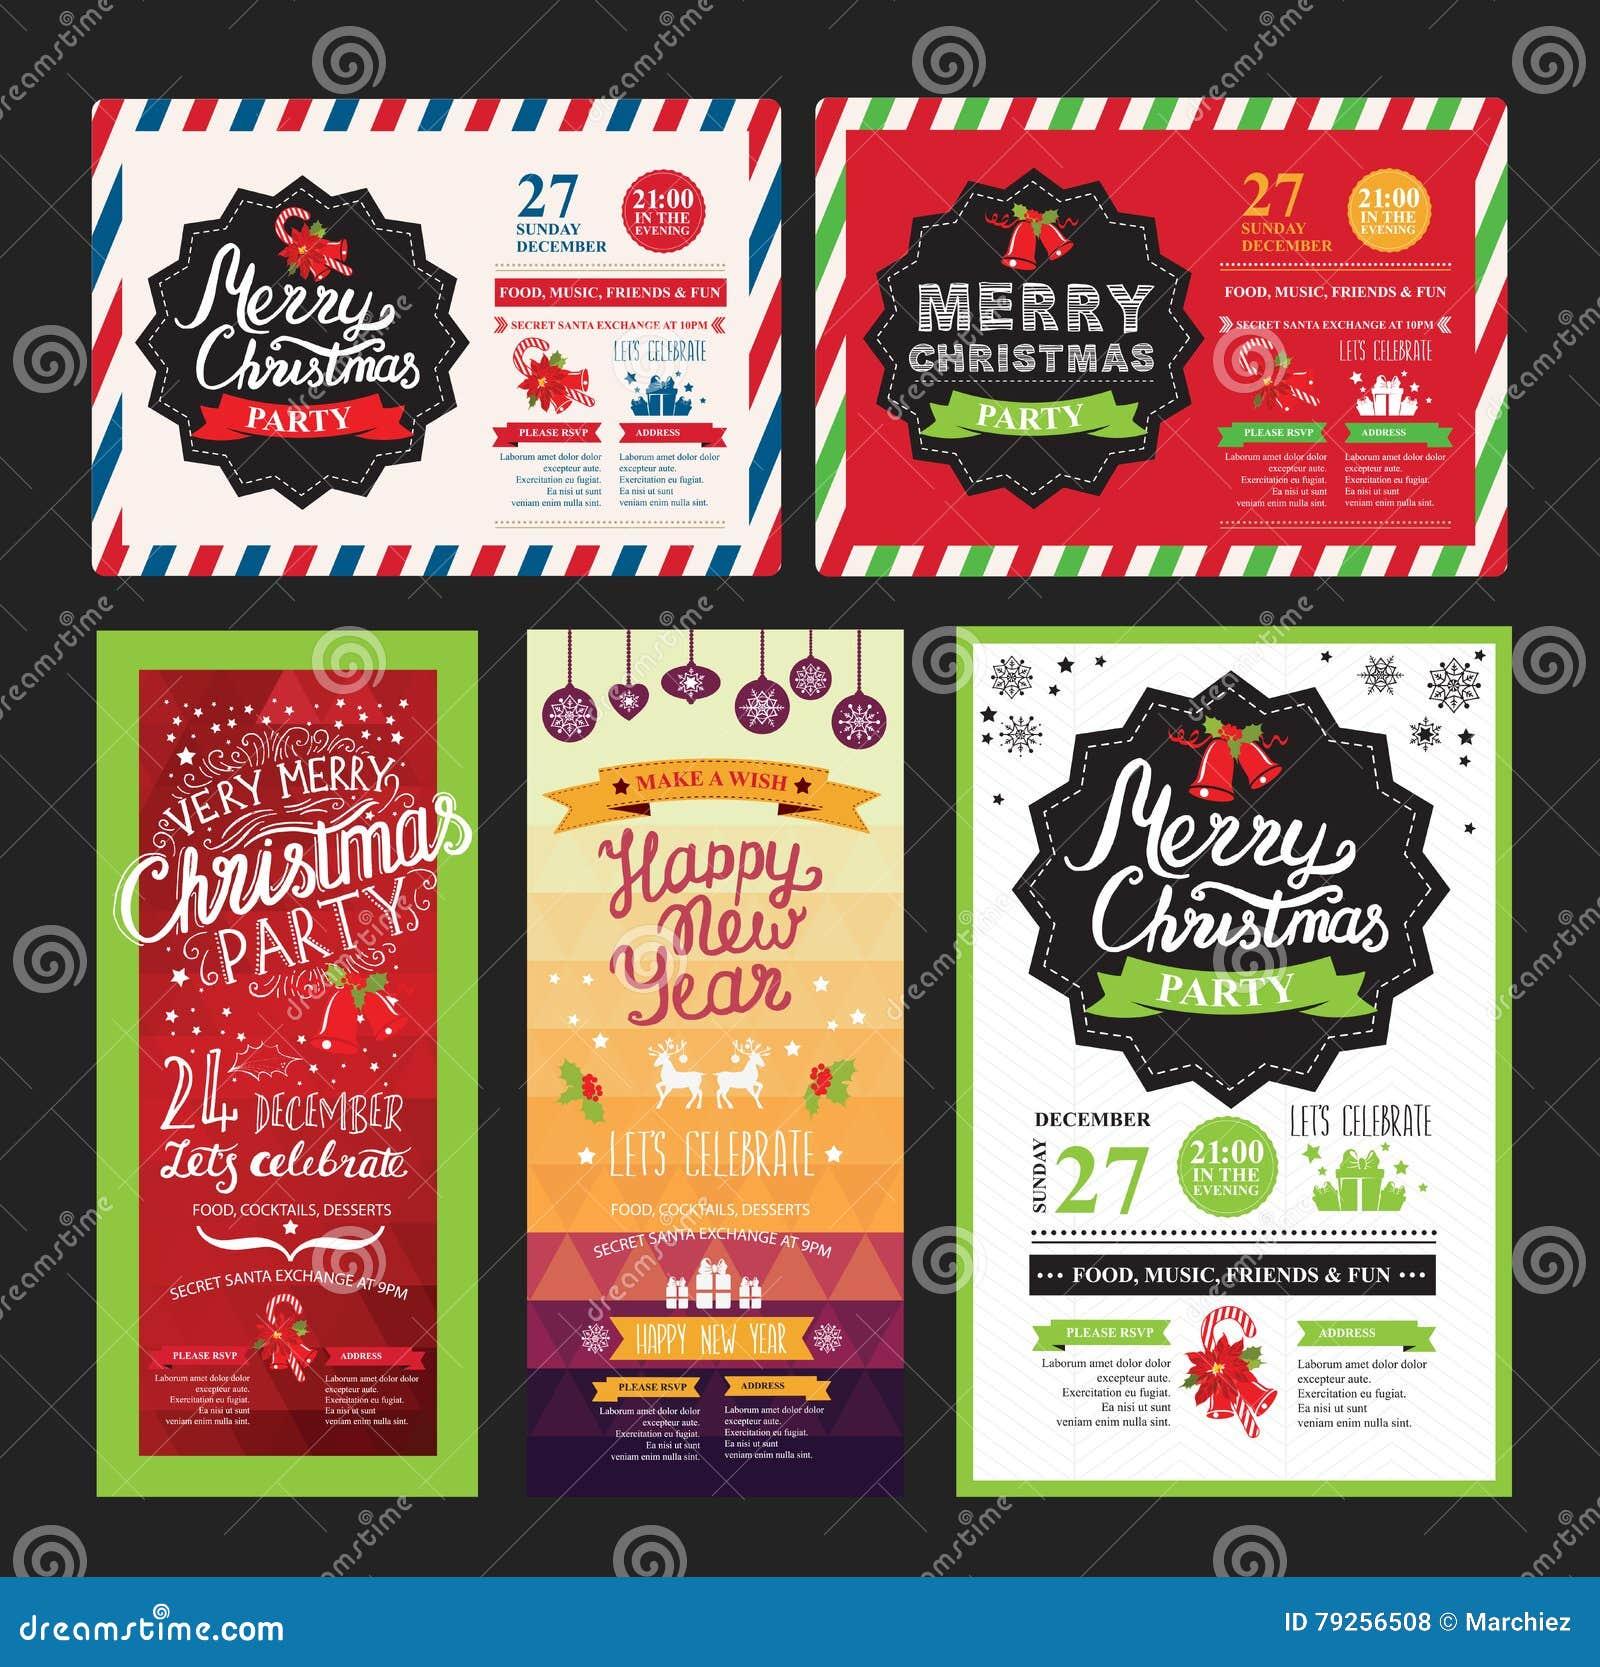 Christmas party invitation food menu restaurant stock vector christmas party invitation food menu restaurant drink cafe stopboris Images